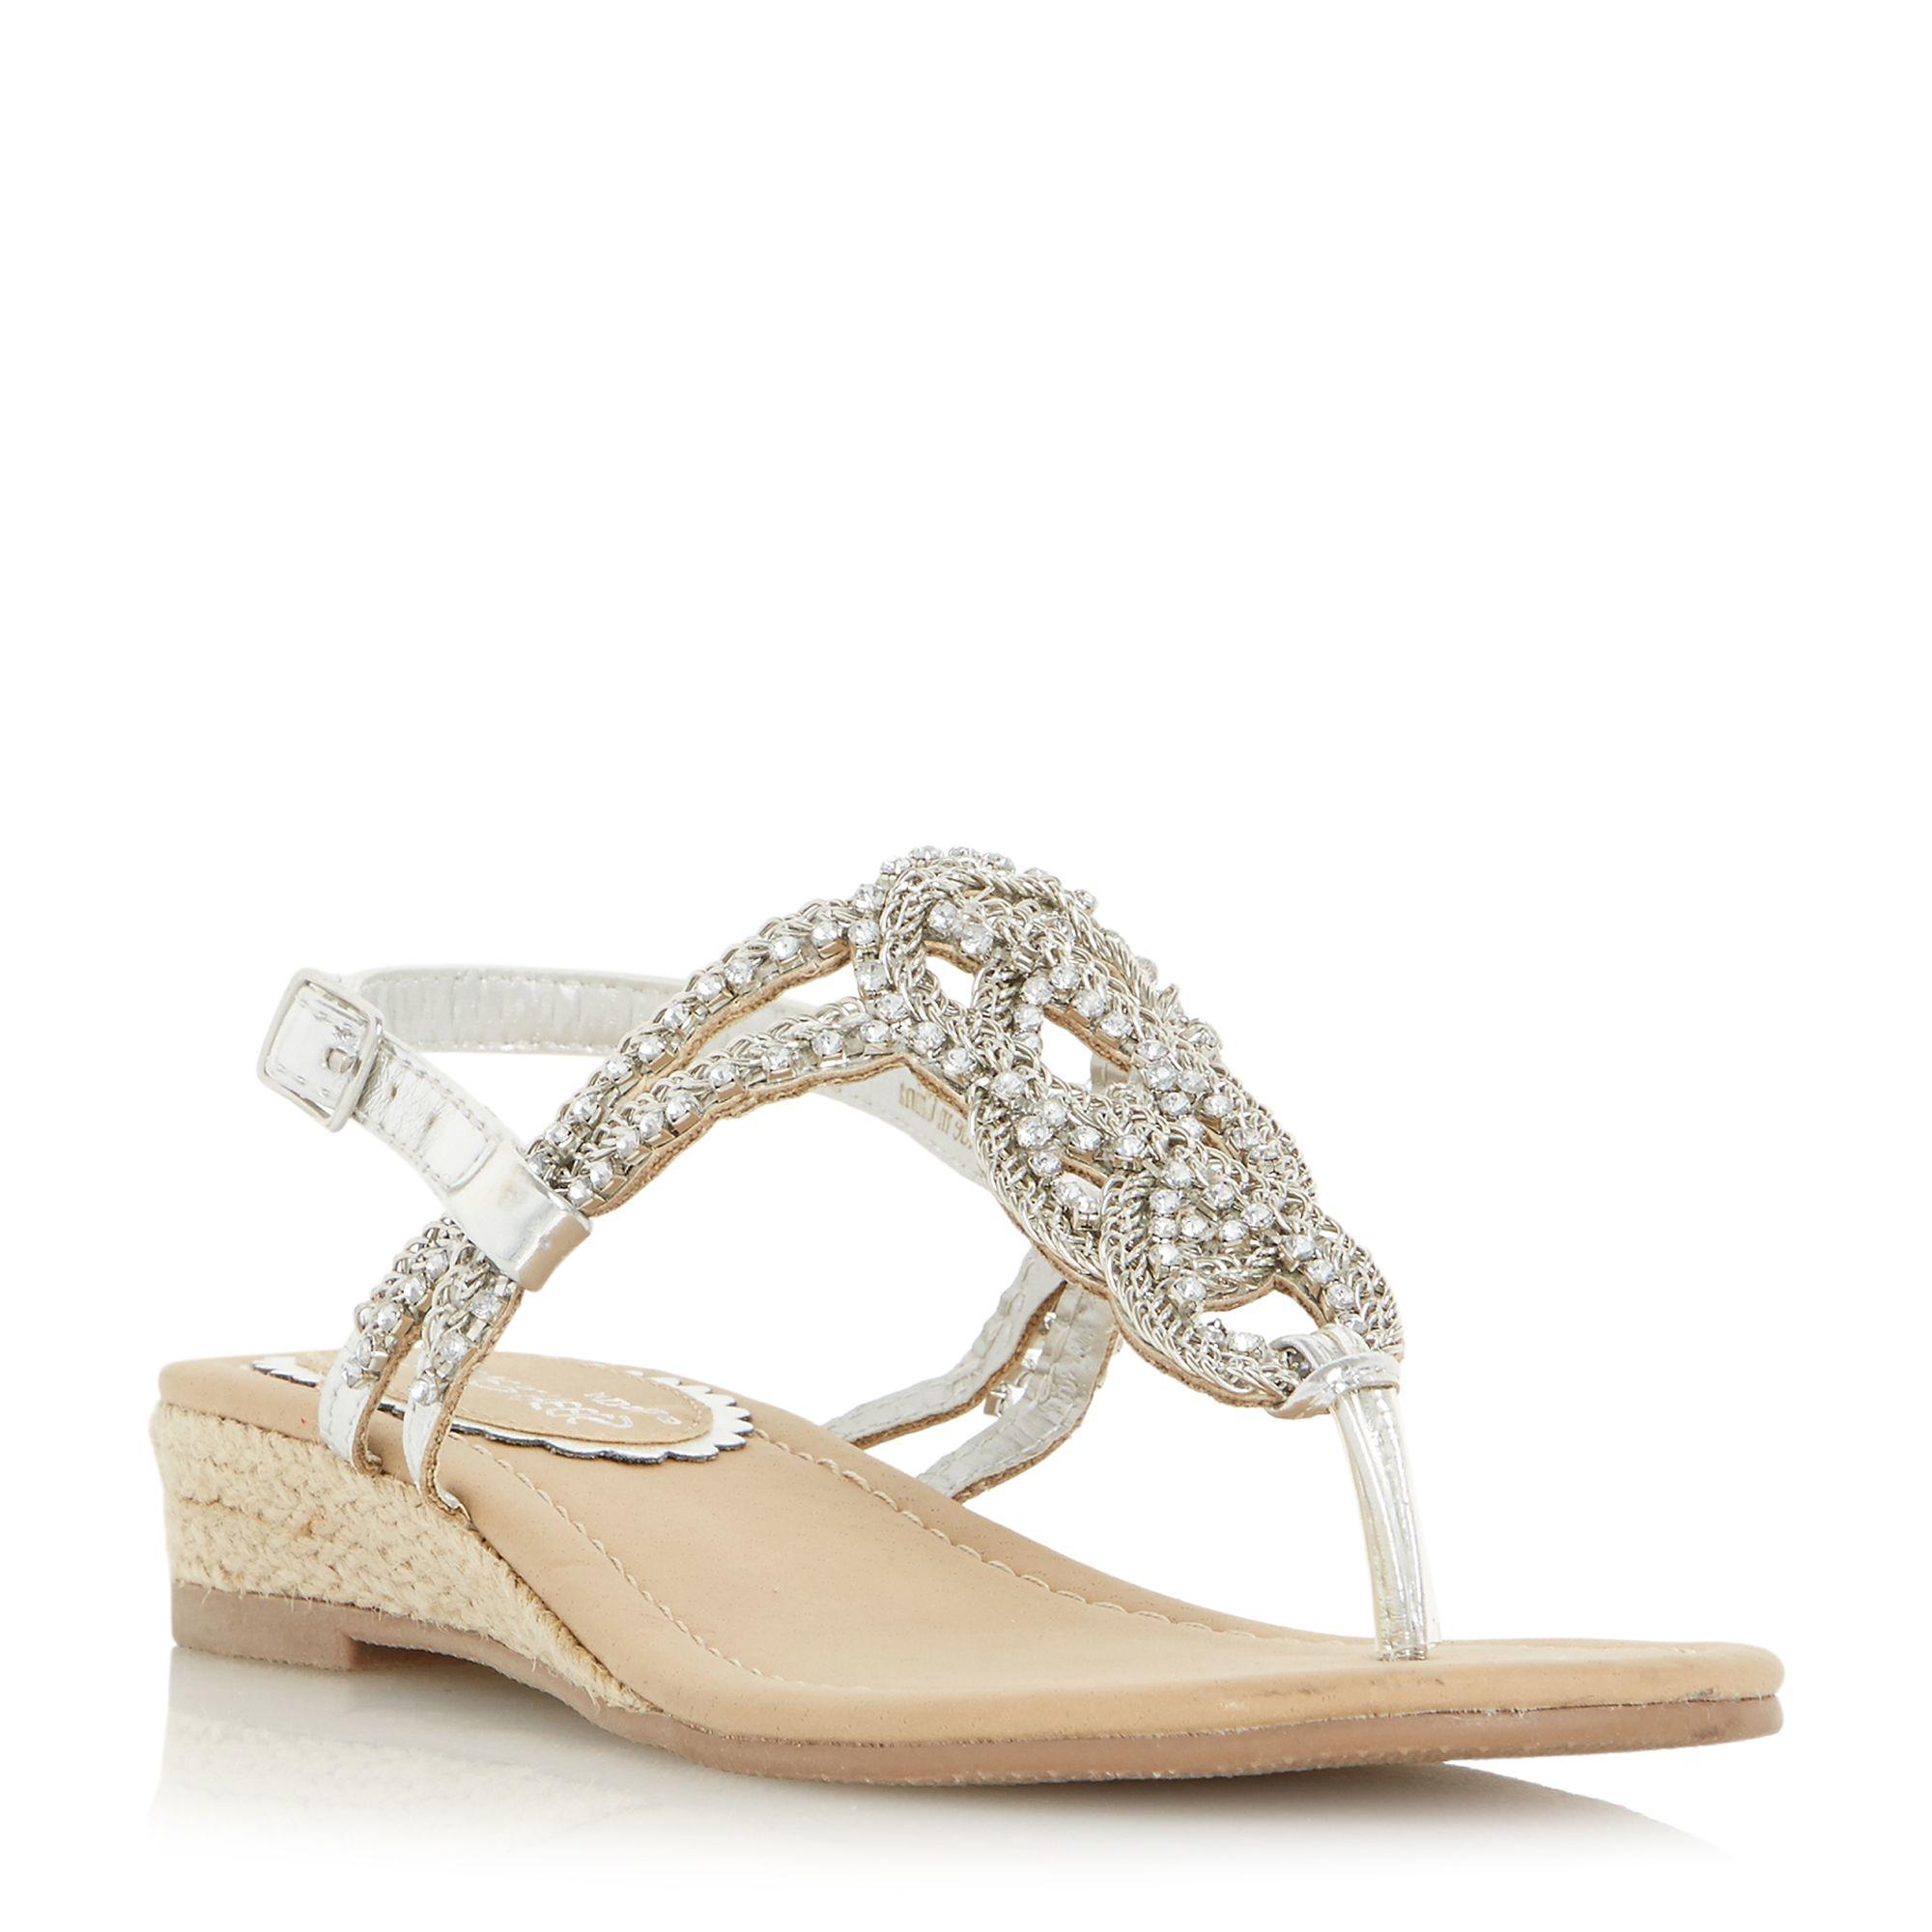 Dune Nixon Embellished Sandals In Metallic Lyst